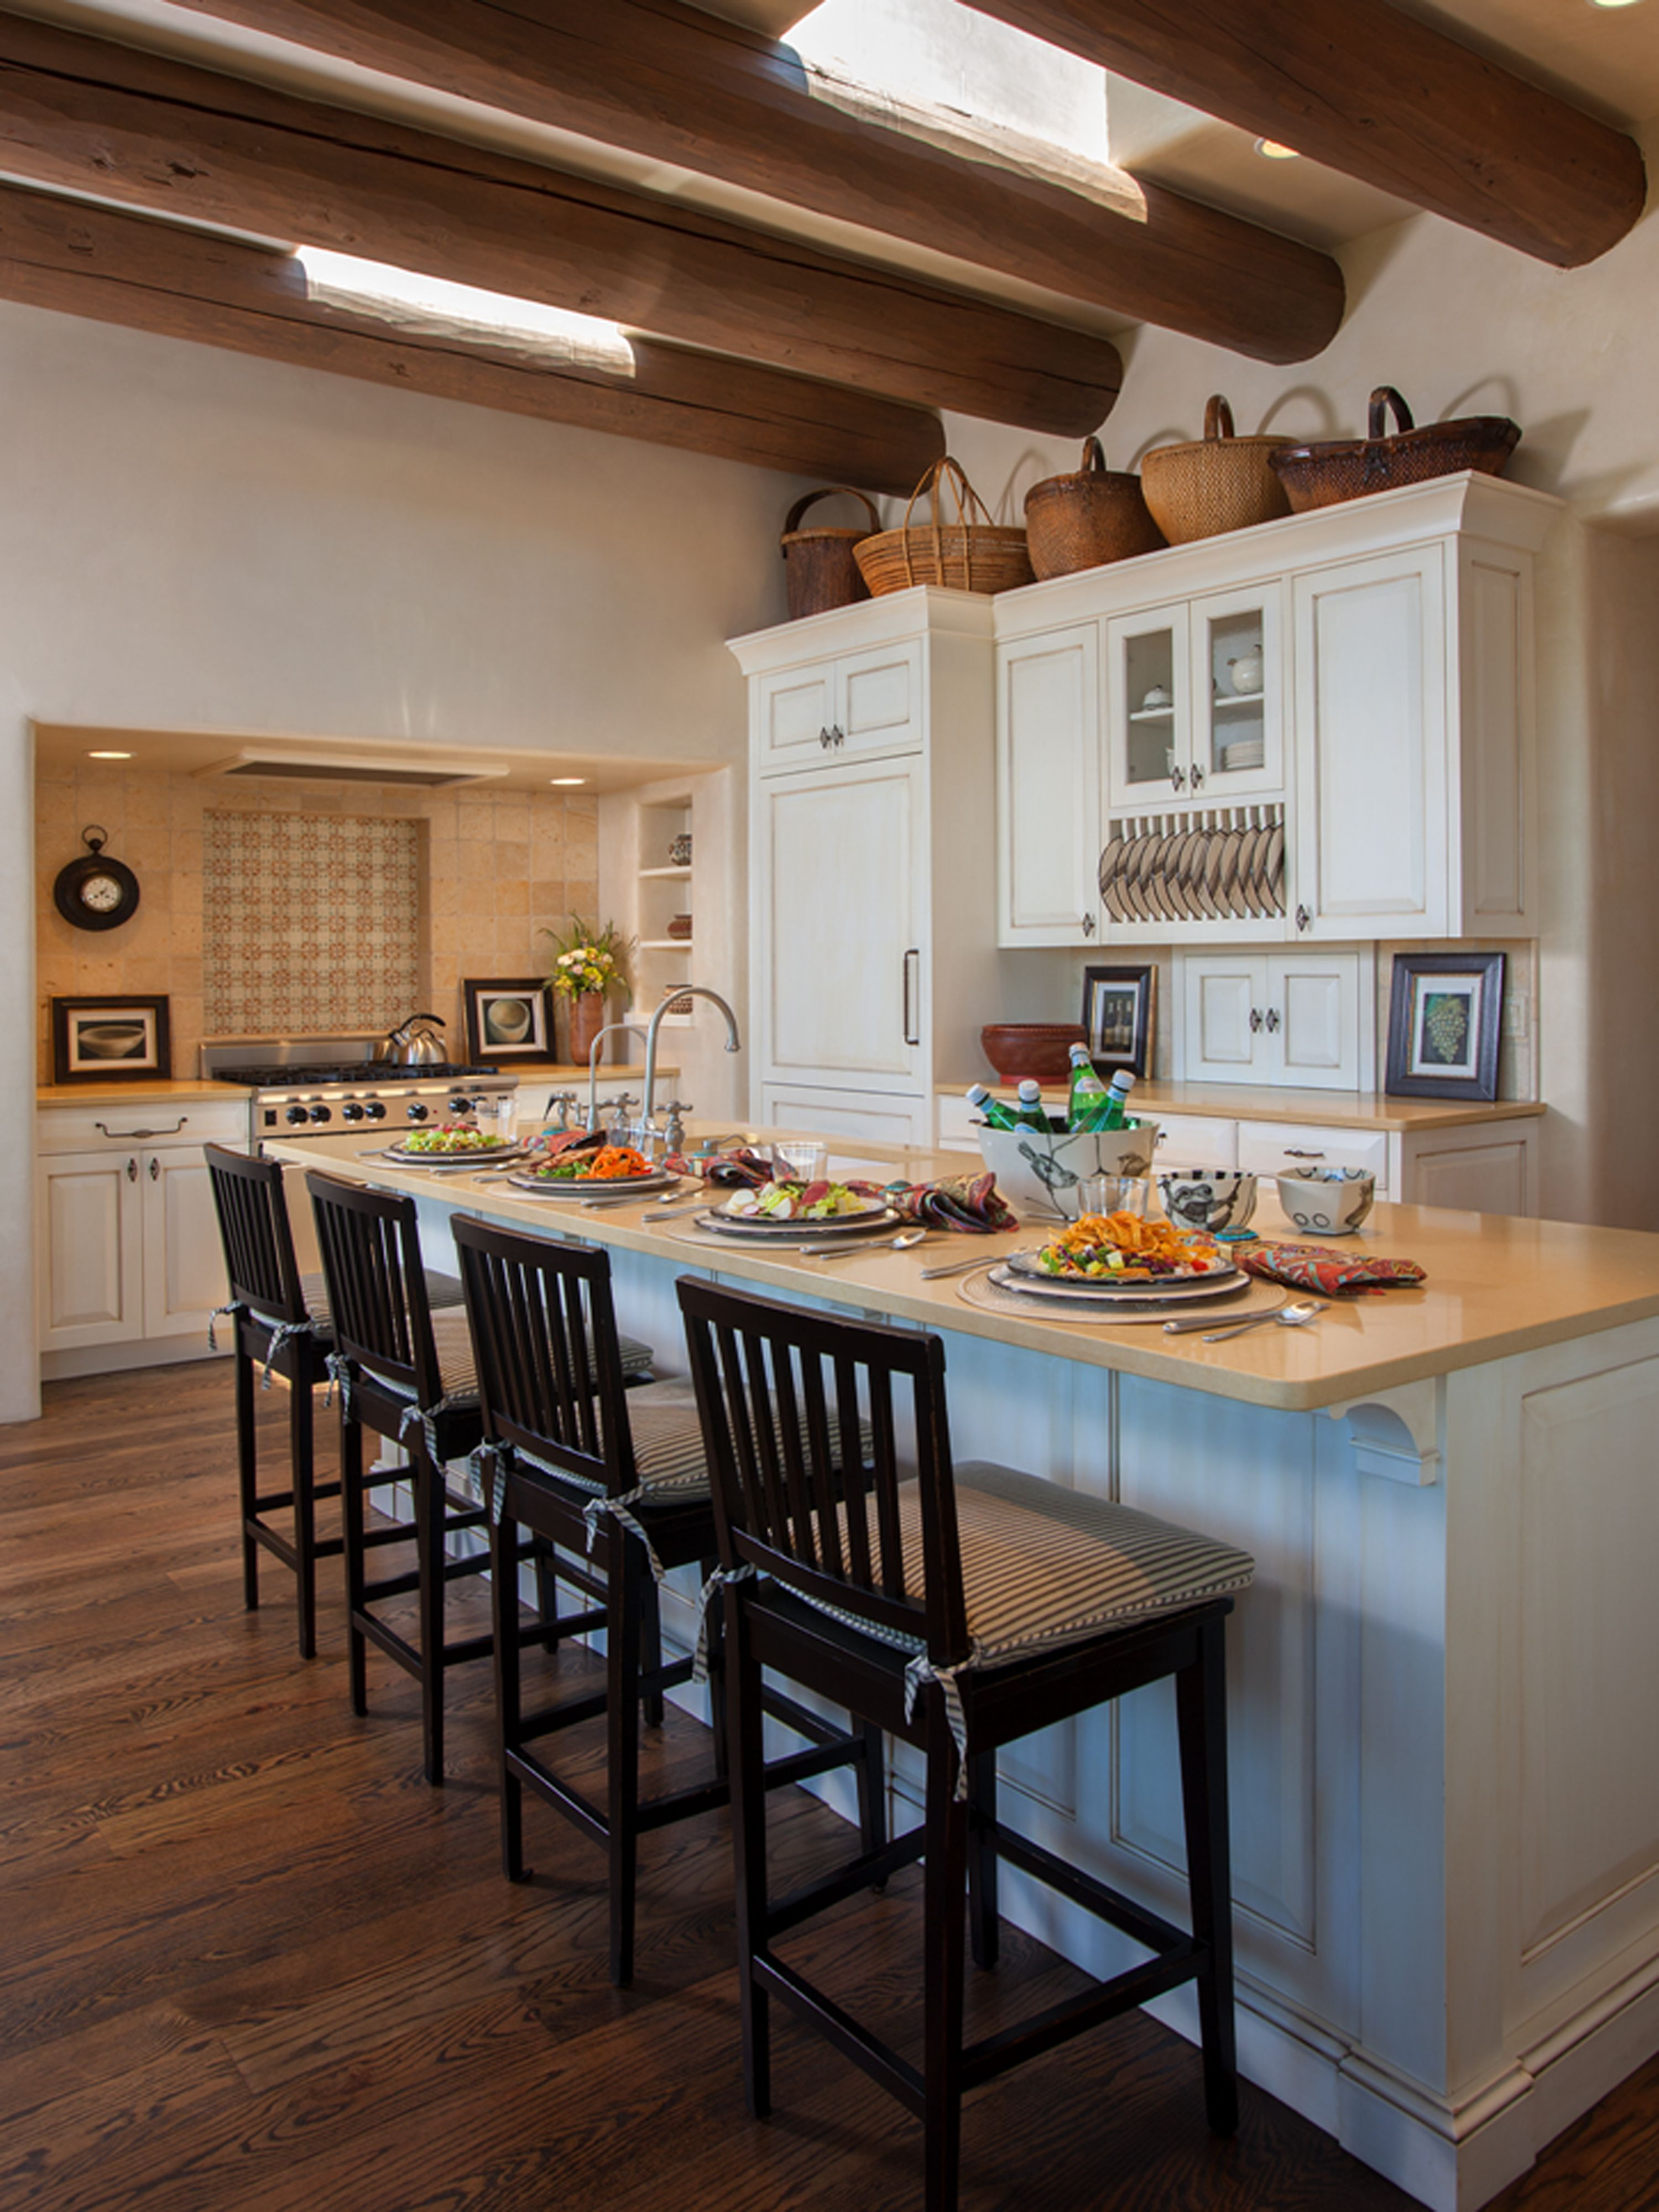 Step Inside A Stunning Adobe Home In Santa Fe Southwestern Home